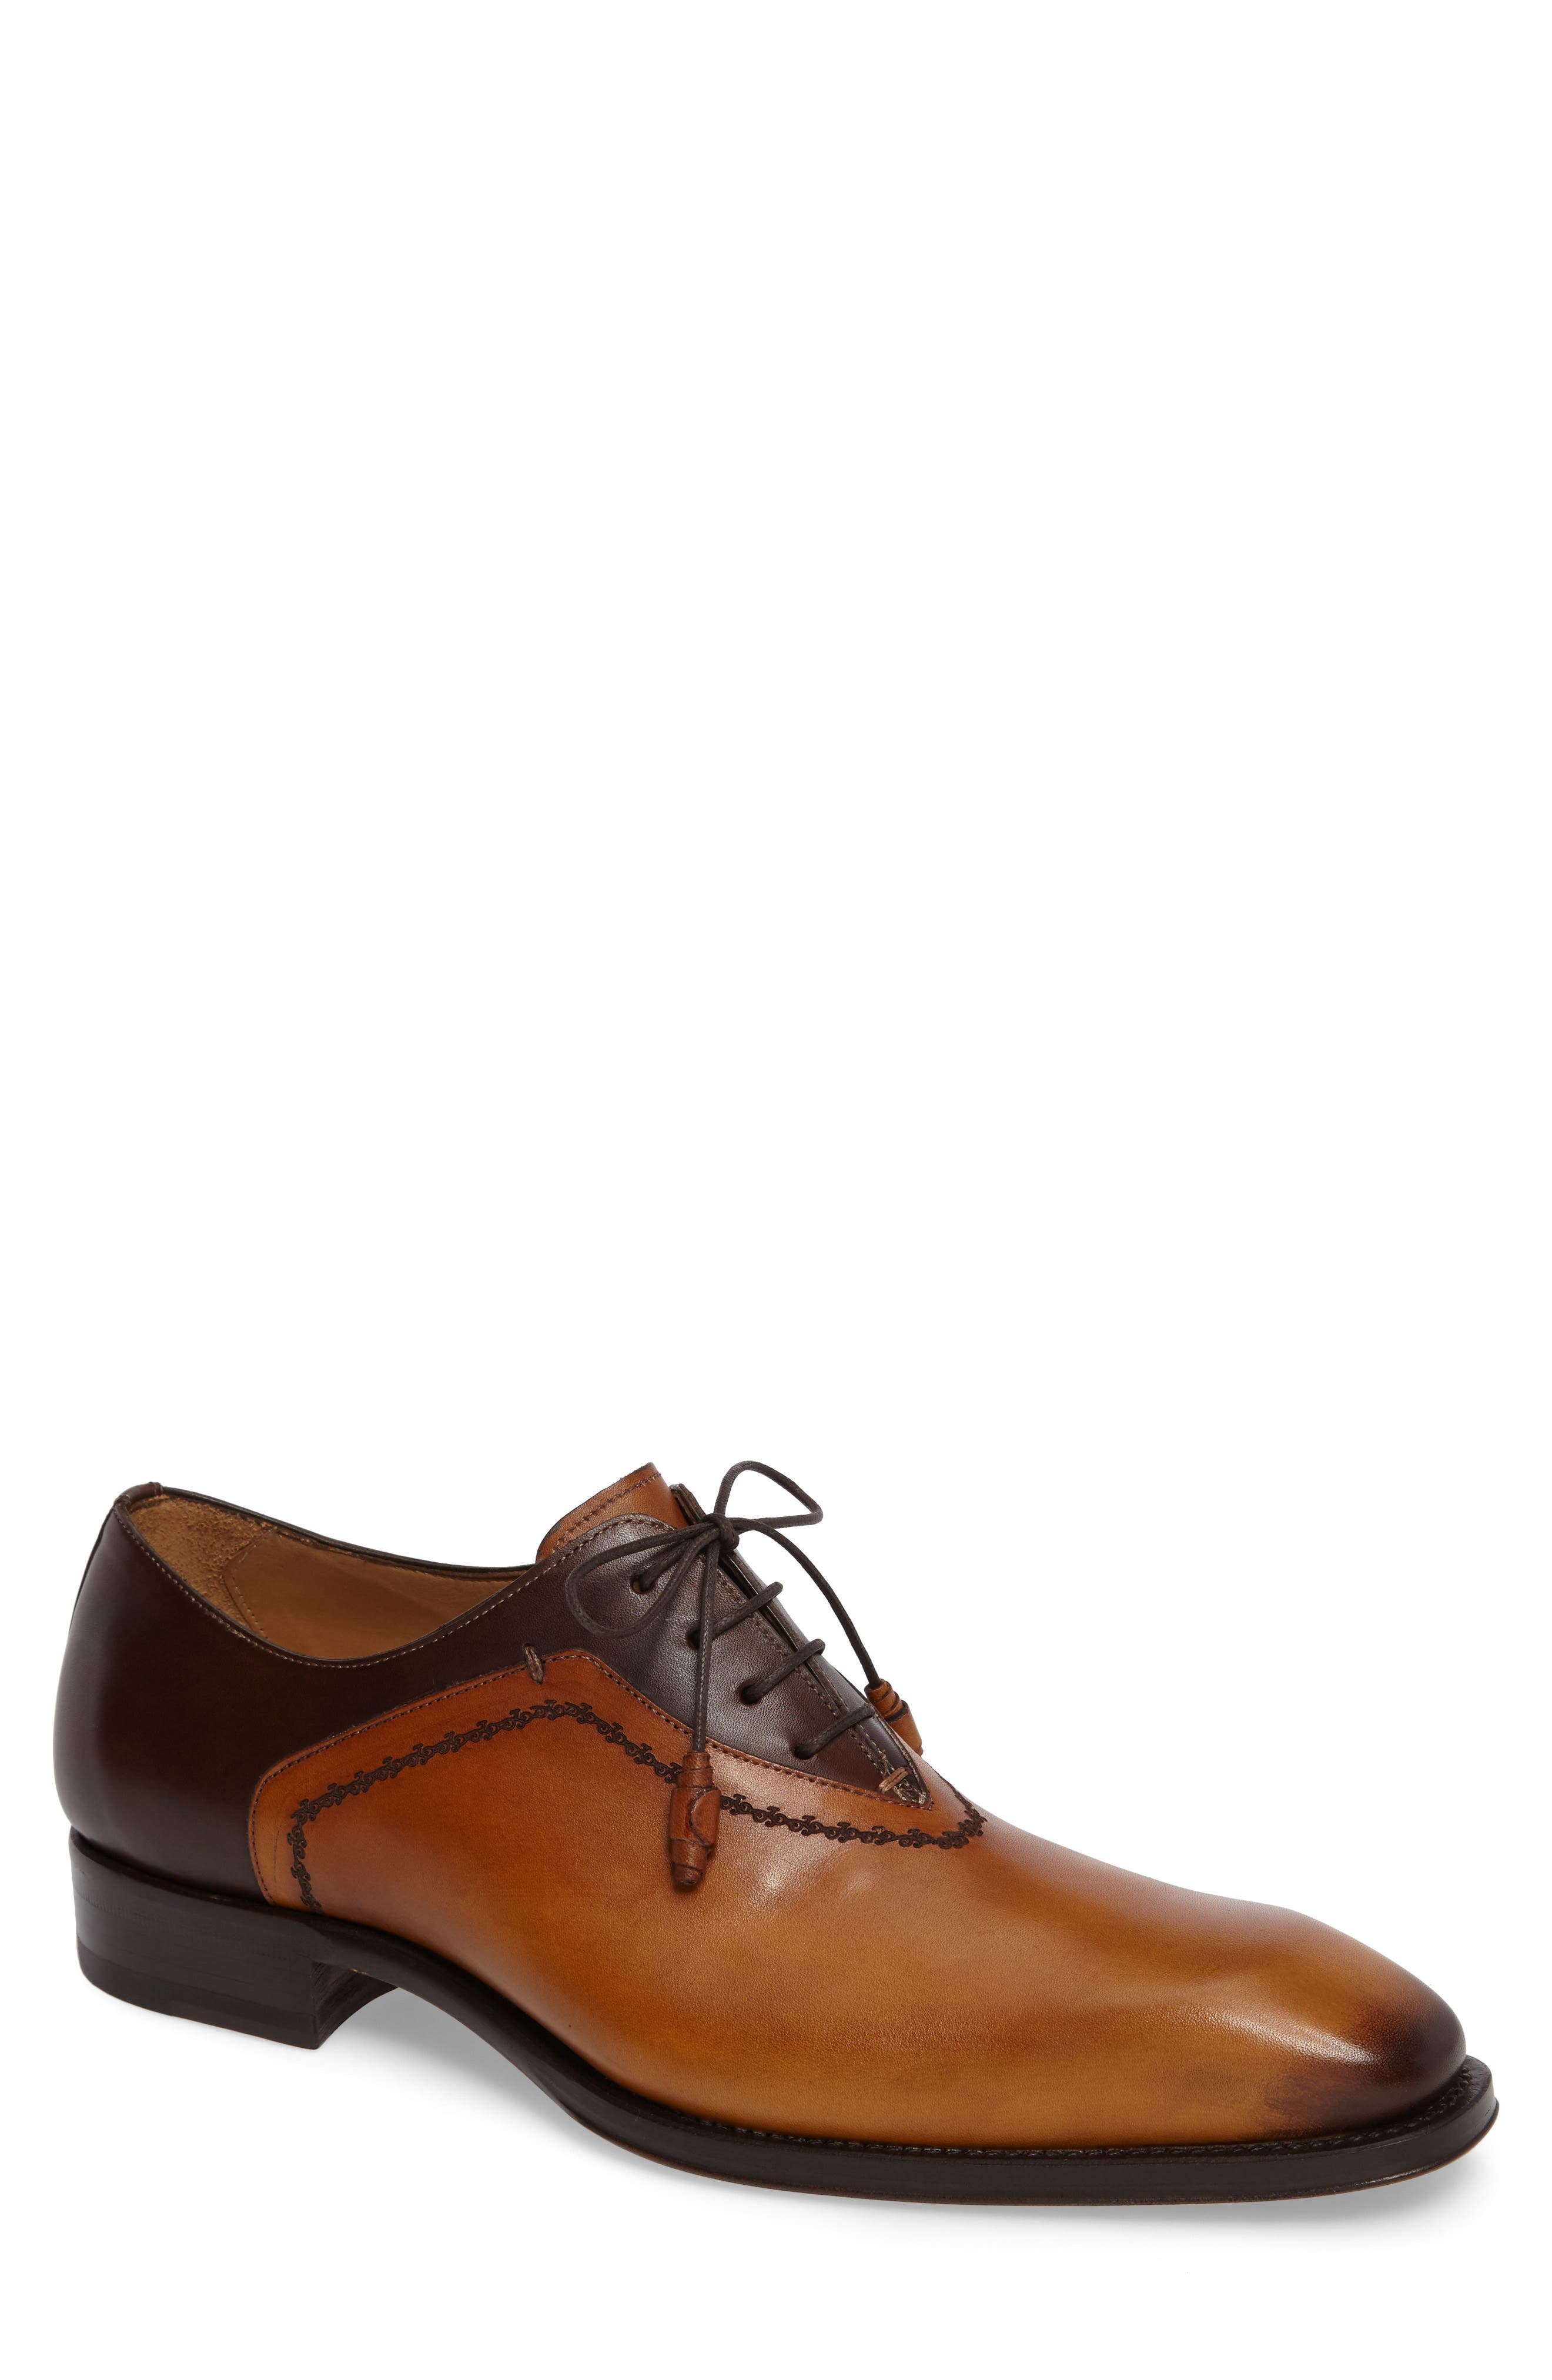 Main Image - Mezlan Manet Plain-Toe Oxford (Men)